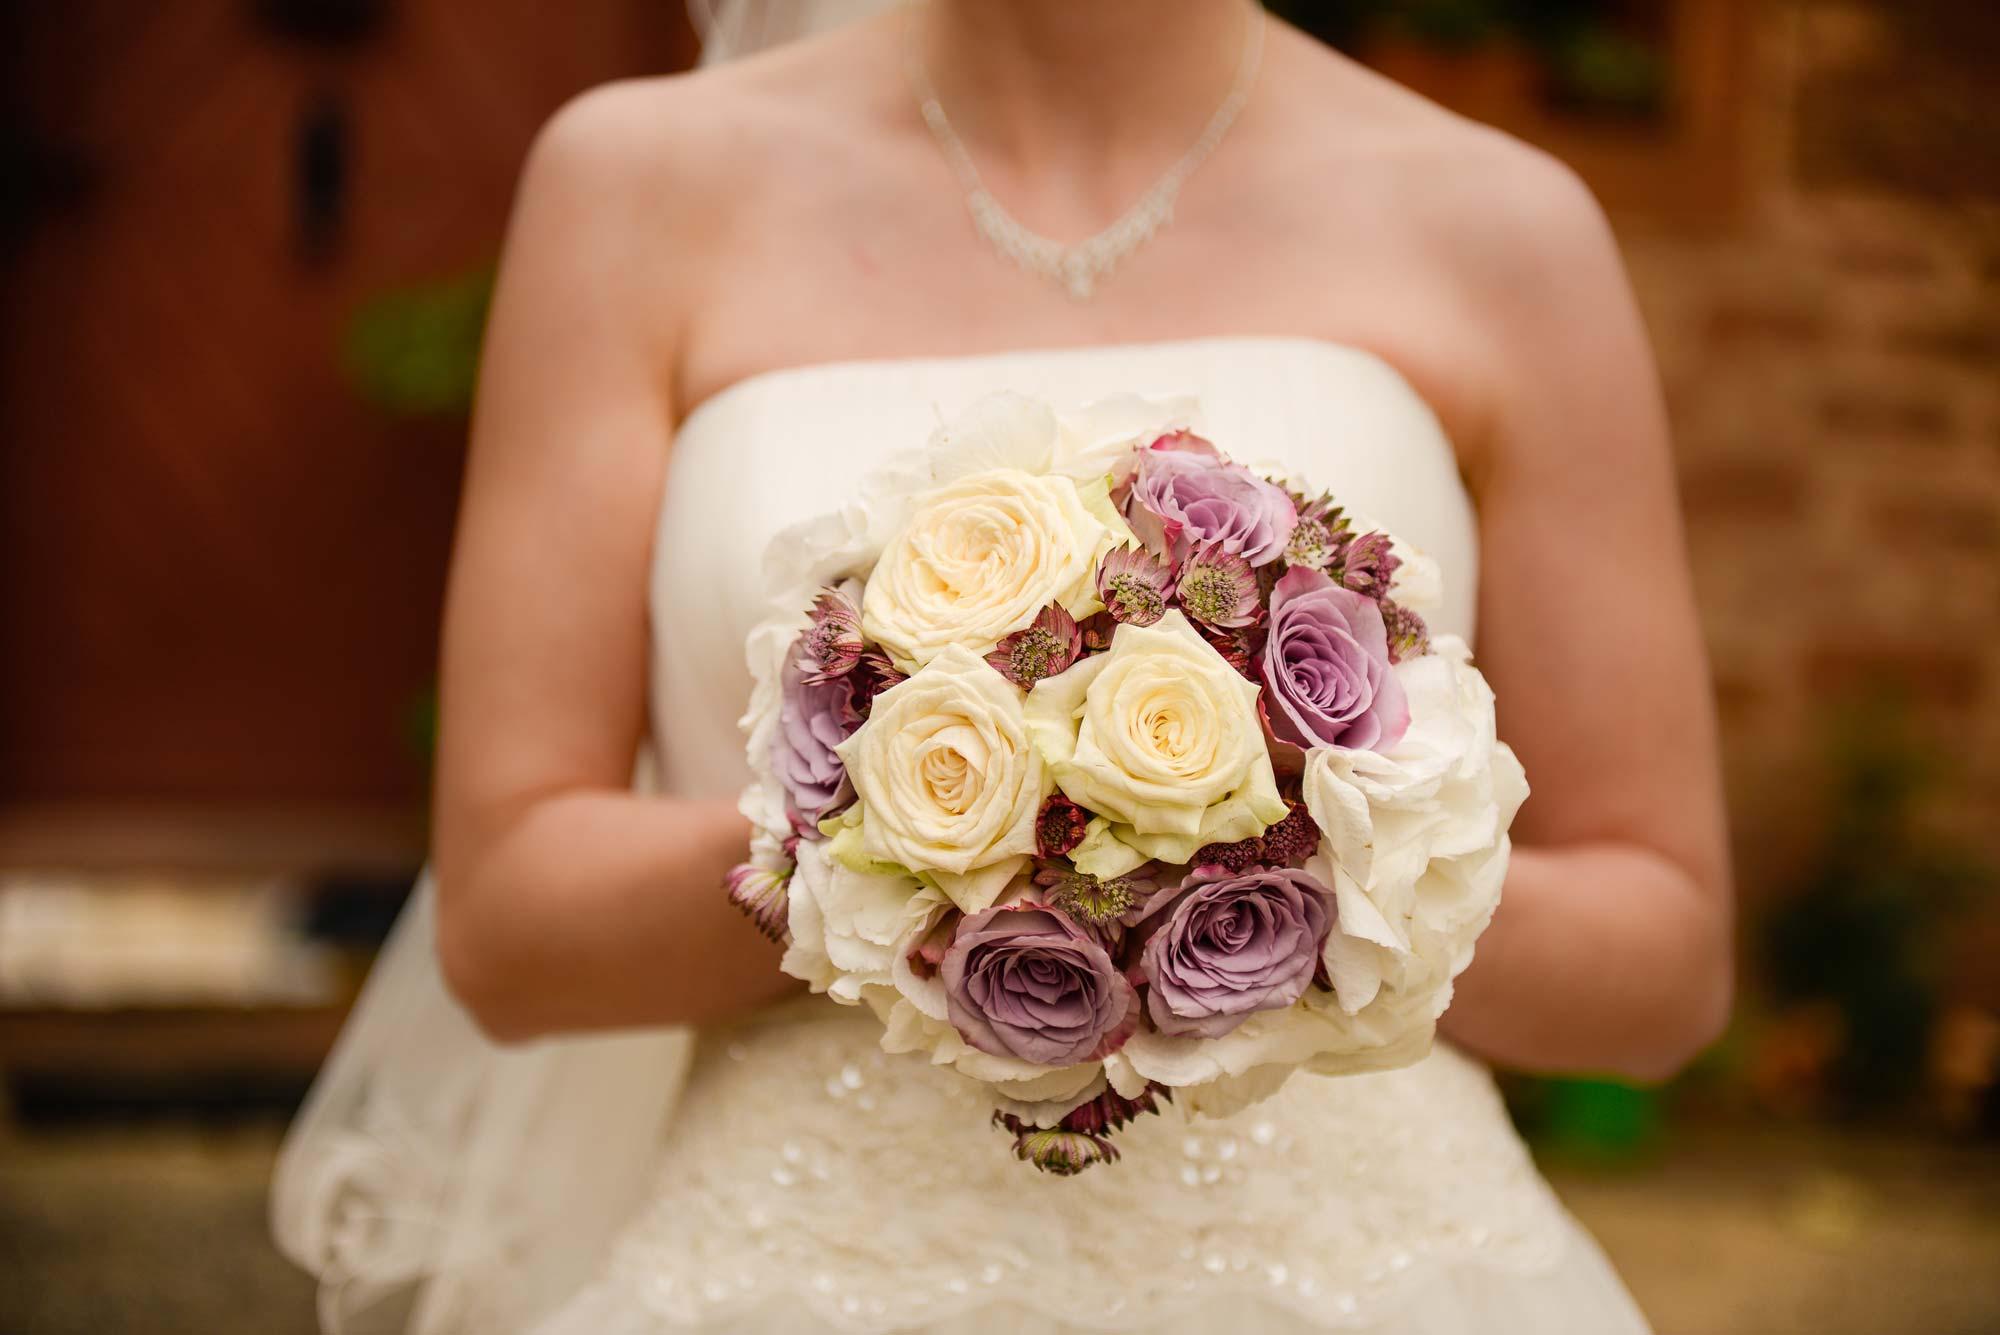 Hochzeitsfotograf • Vitali Skidan Fotokurs Bayern